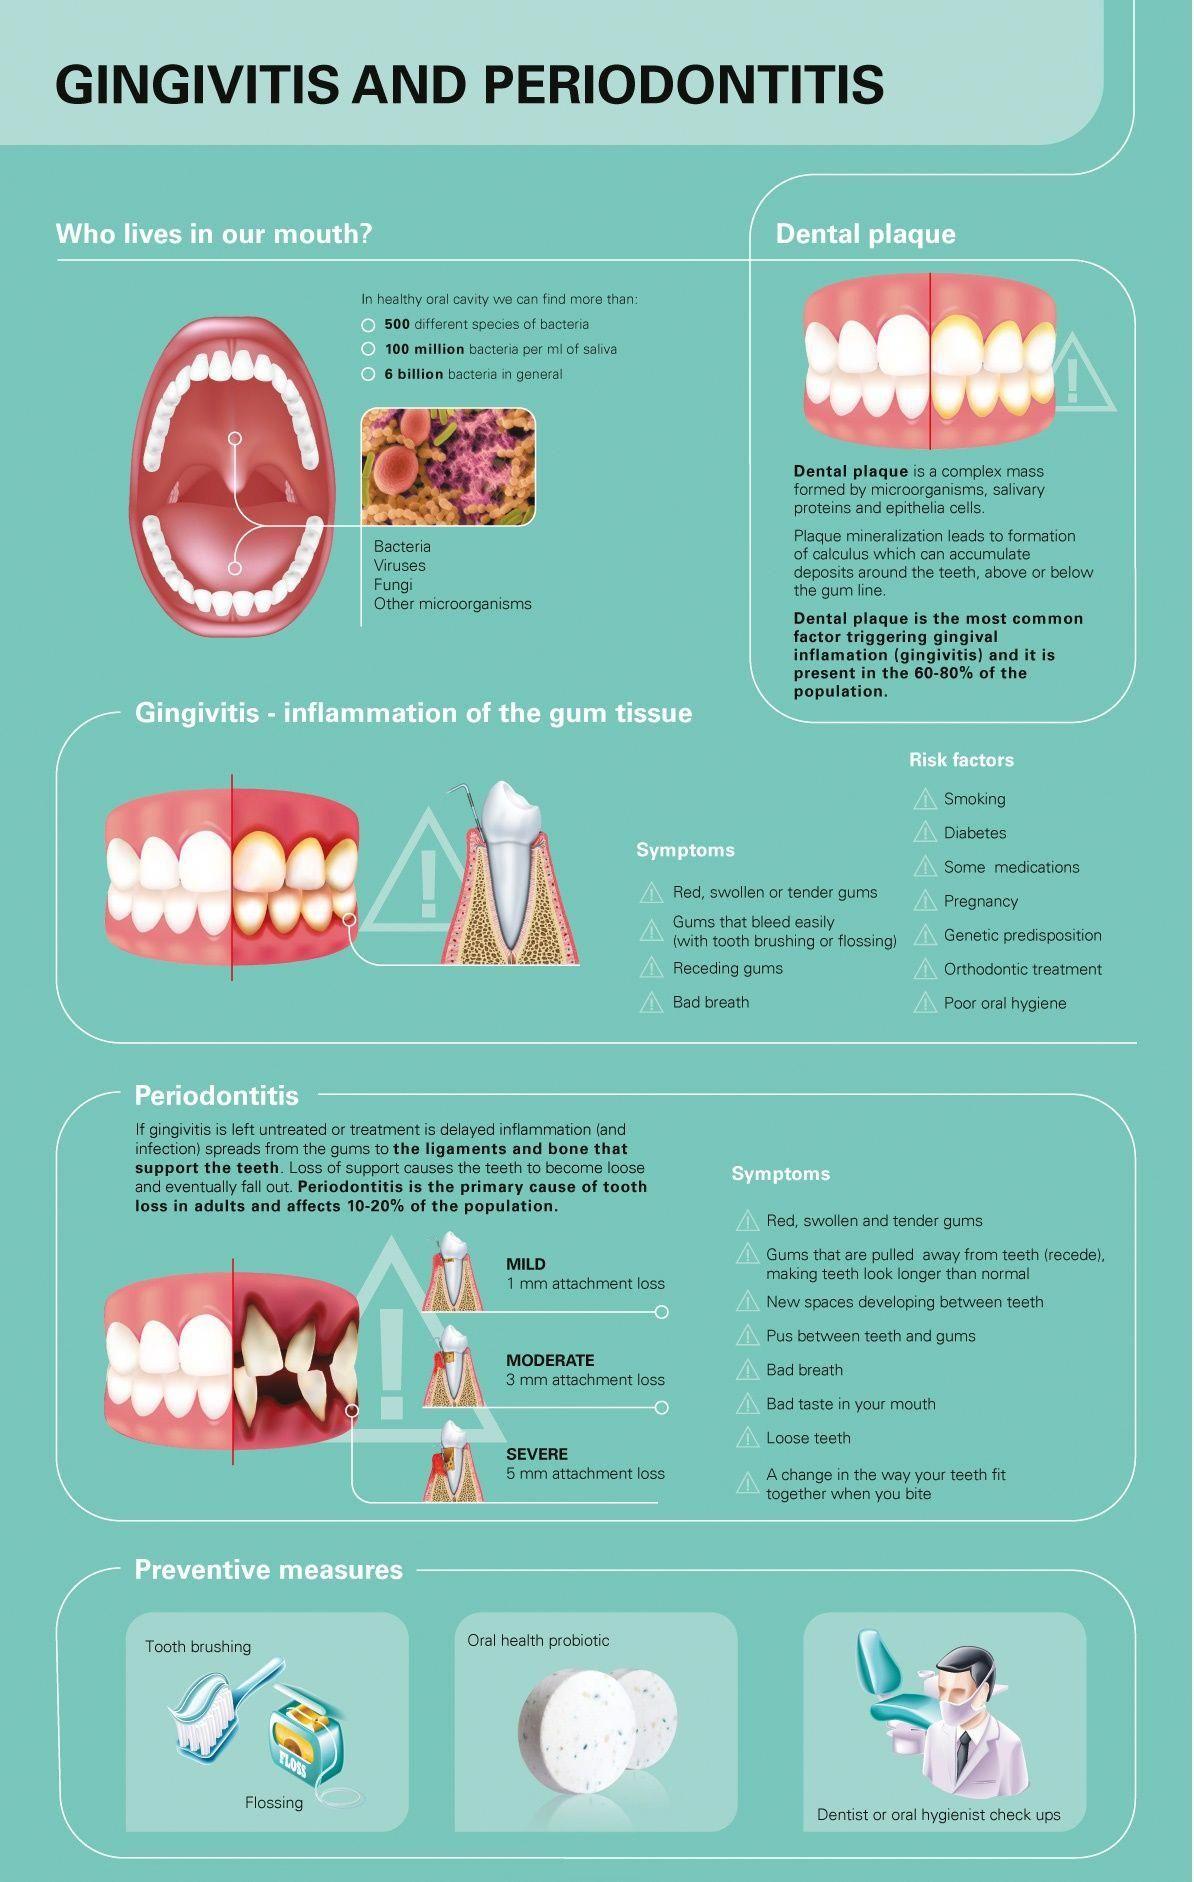 Gingivitis and periodontists gumdiseasecure gum disease